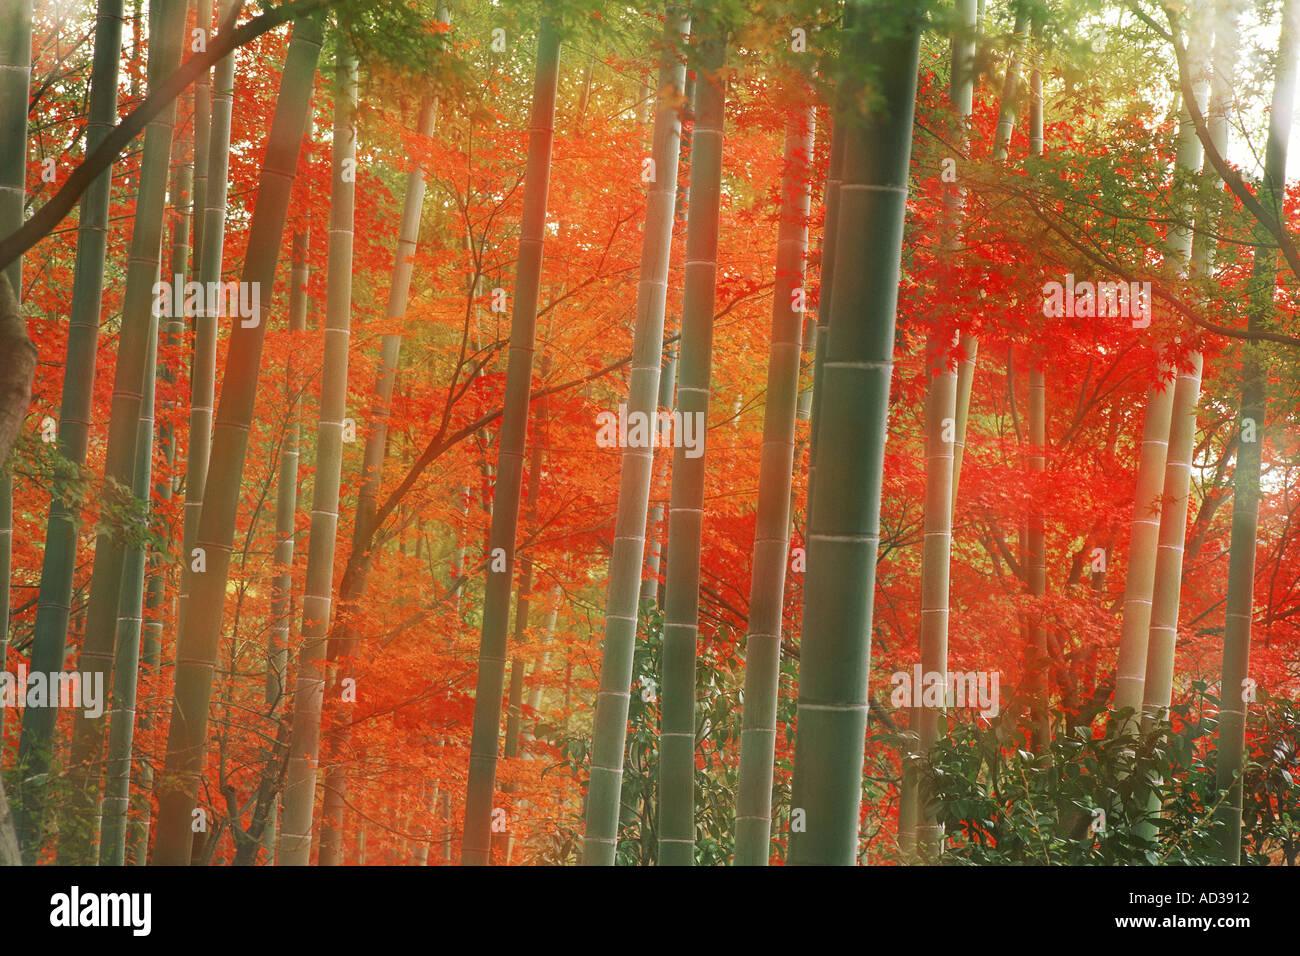 Fall Woodsy Pc Wallpaper Misty Sun Filling Bamboo Forest In Autumn At Arashiyama